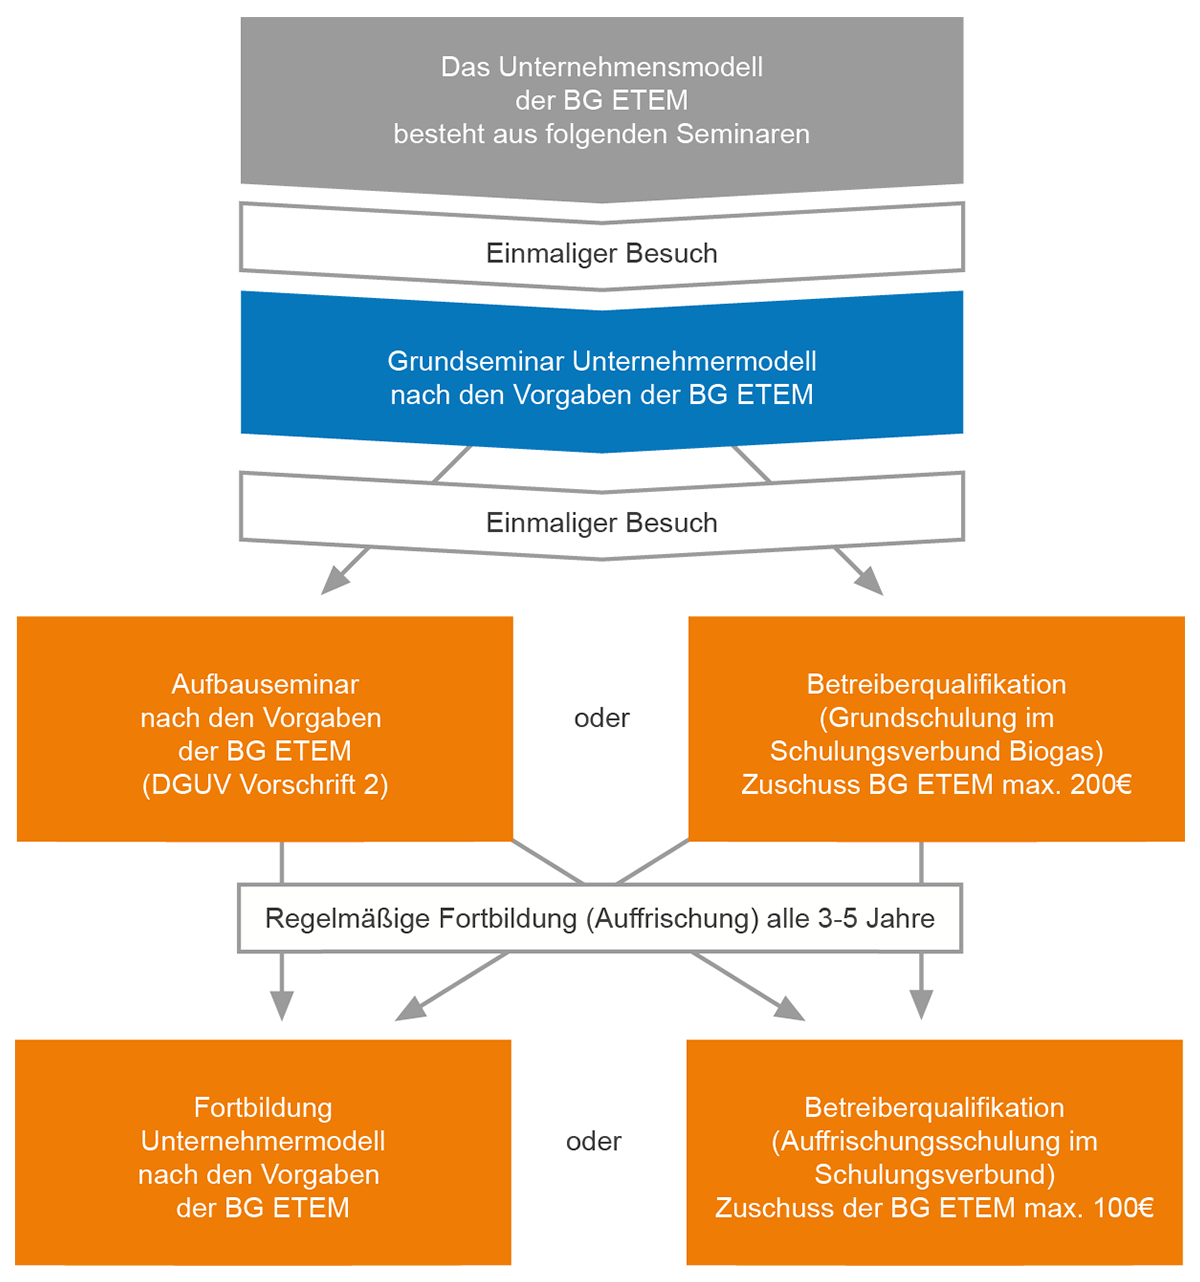 infografik-unternehmermodell-bg-etem